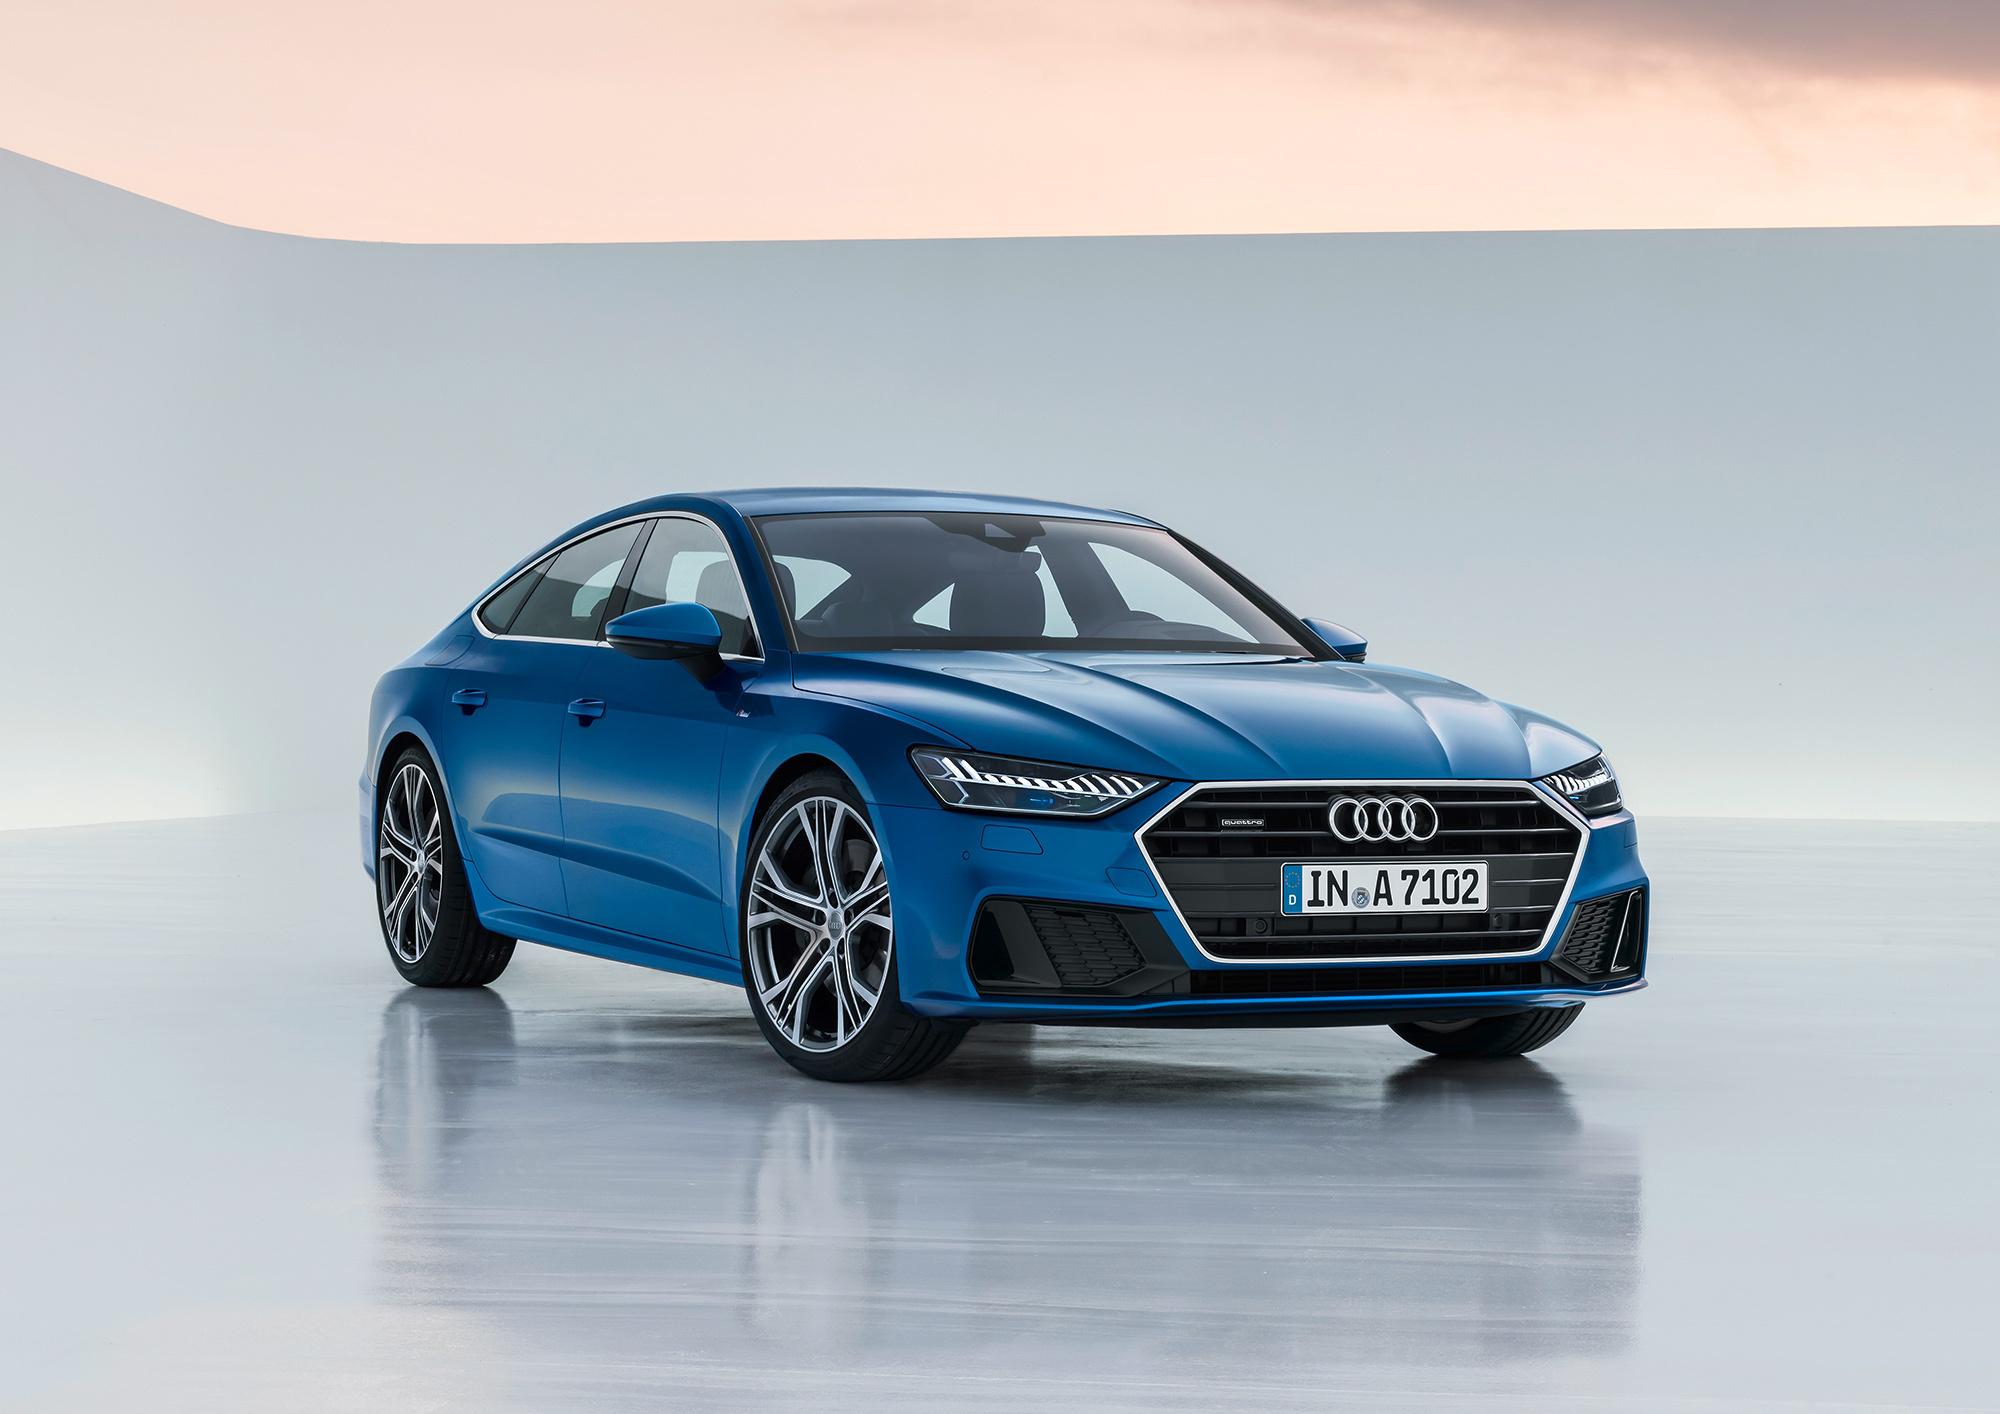 Audi A7 Sportback Wallpapers HD